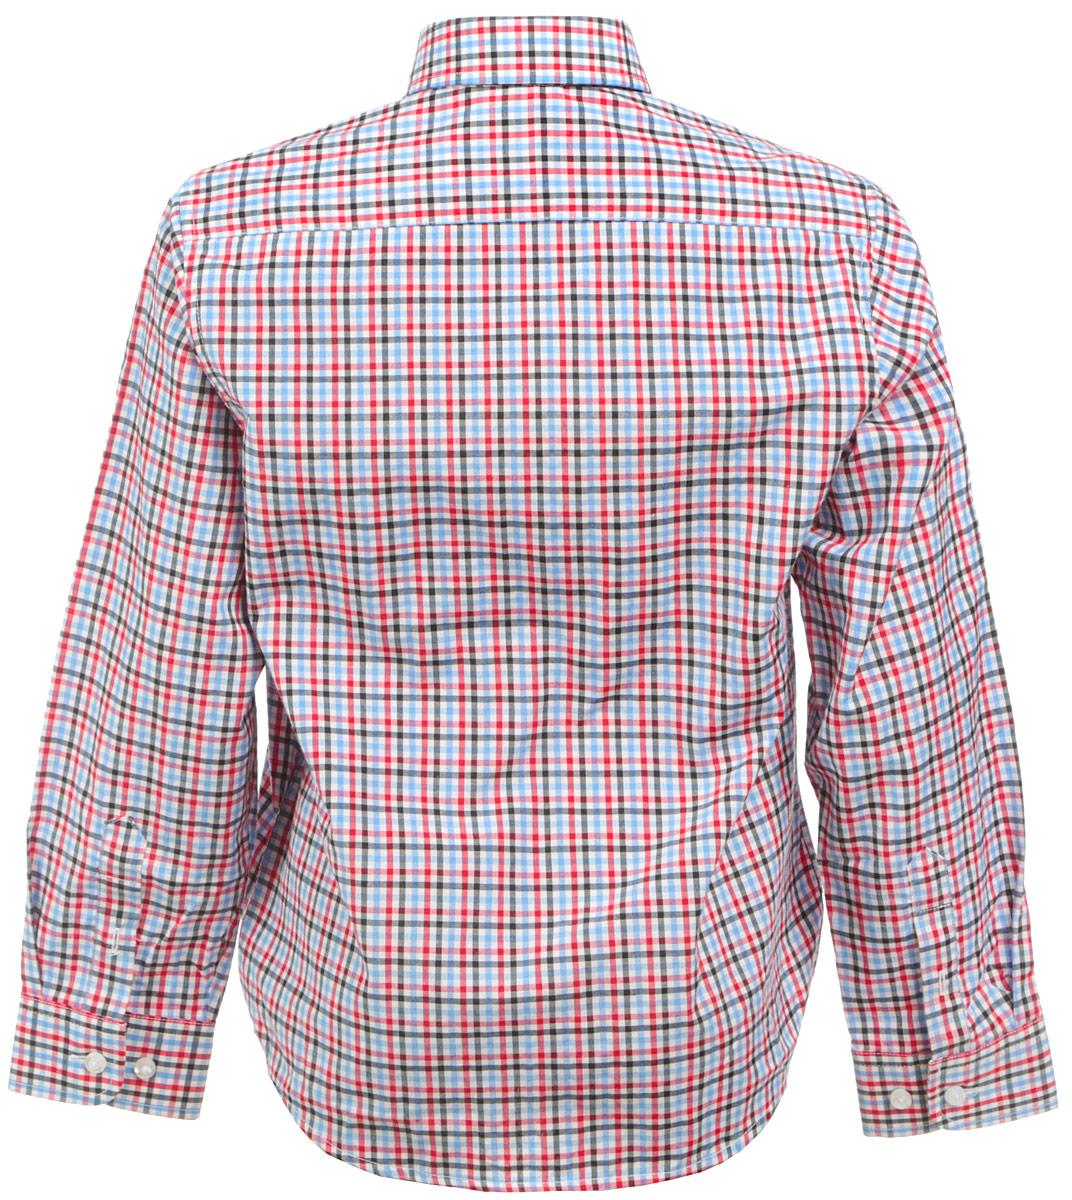 Imperator Рубашка для мальчика. TR. 102/ST/038/25